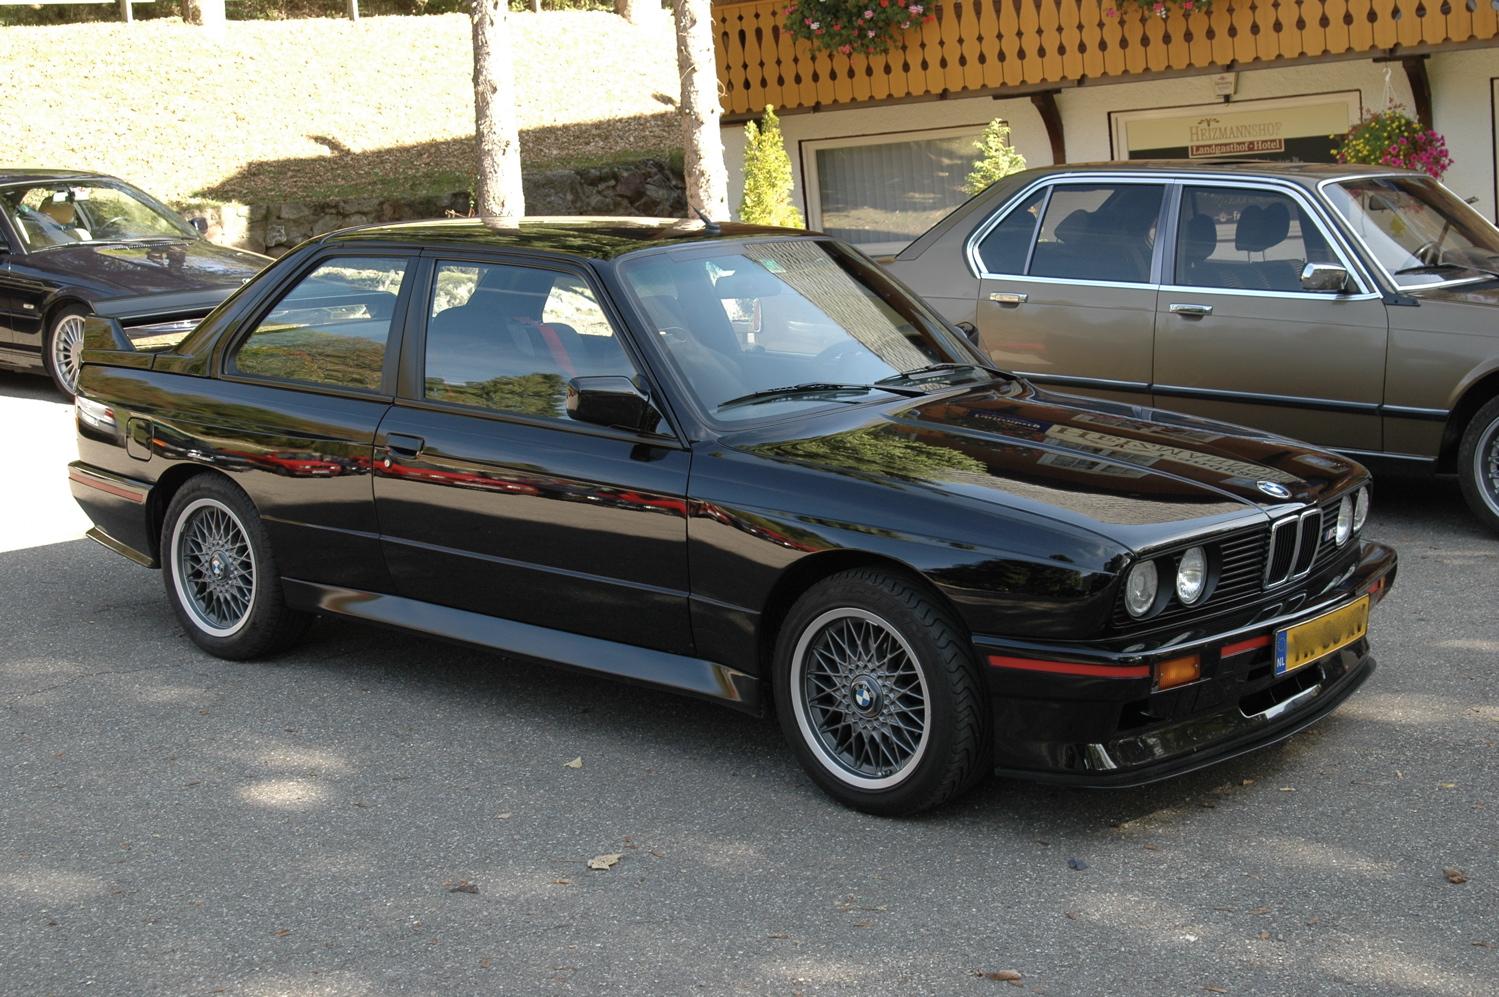 bmw classic |Classic Cars